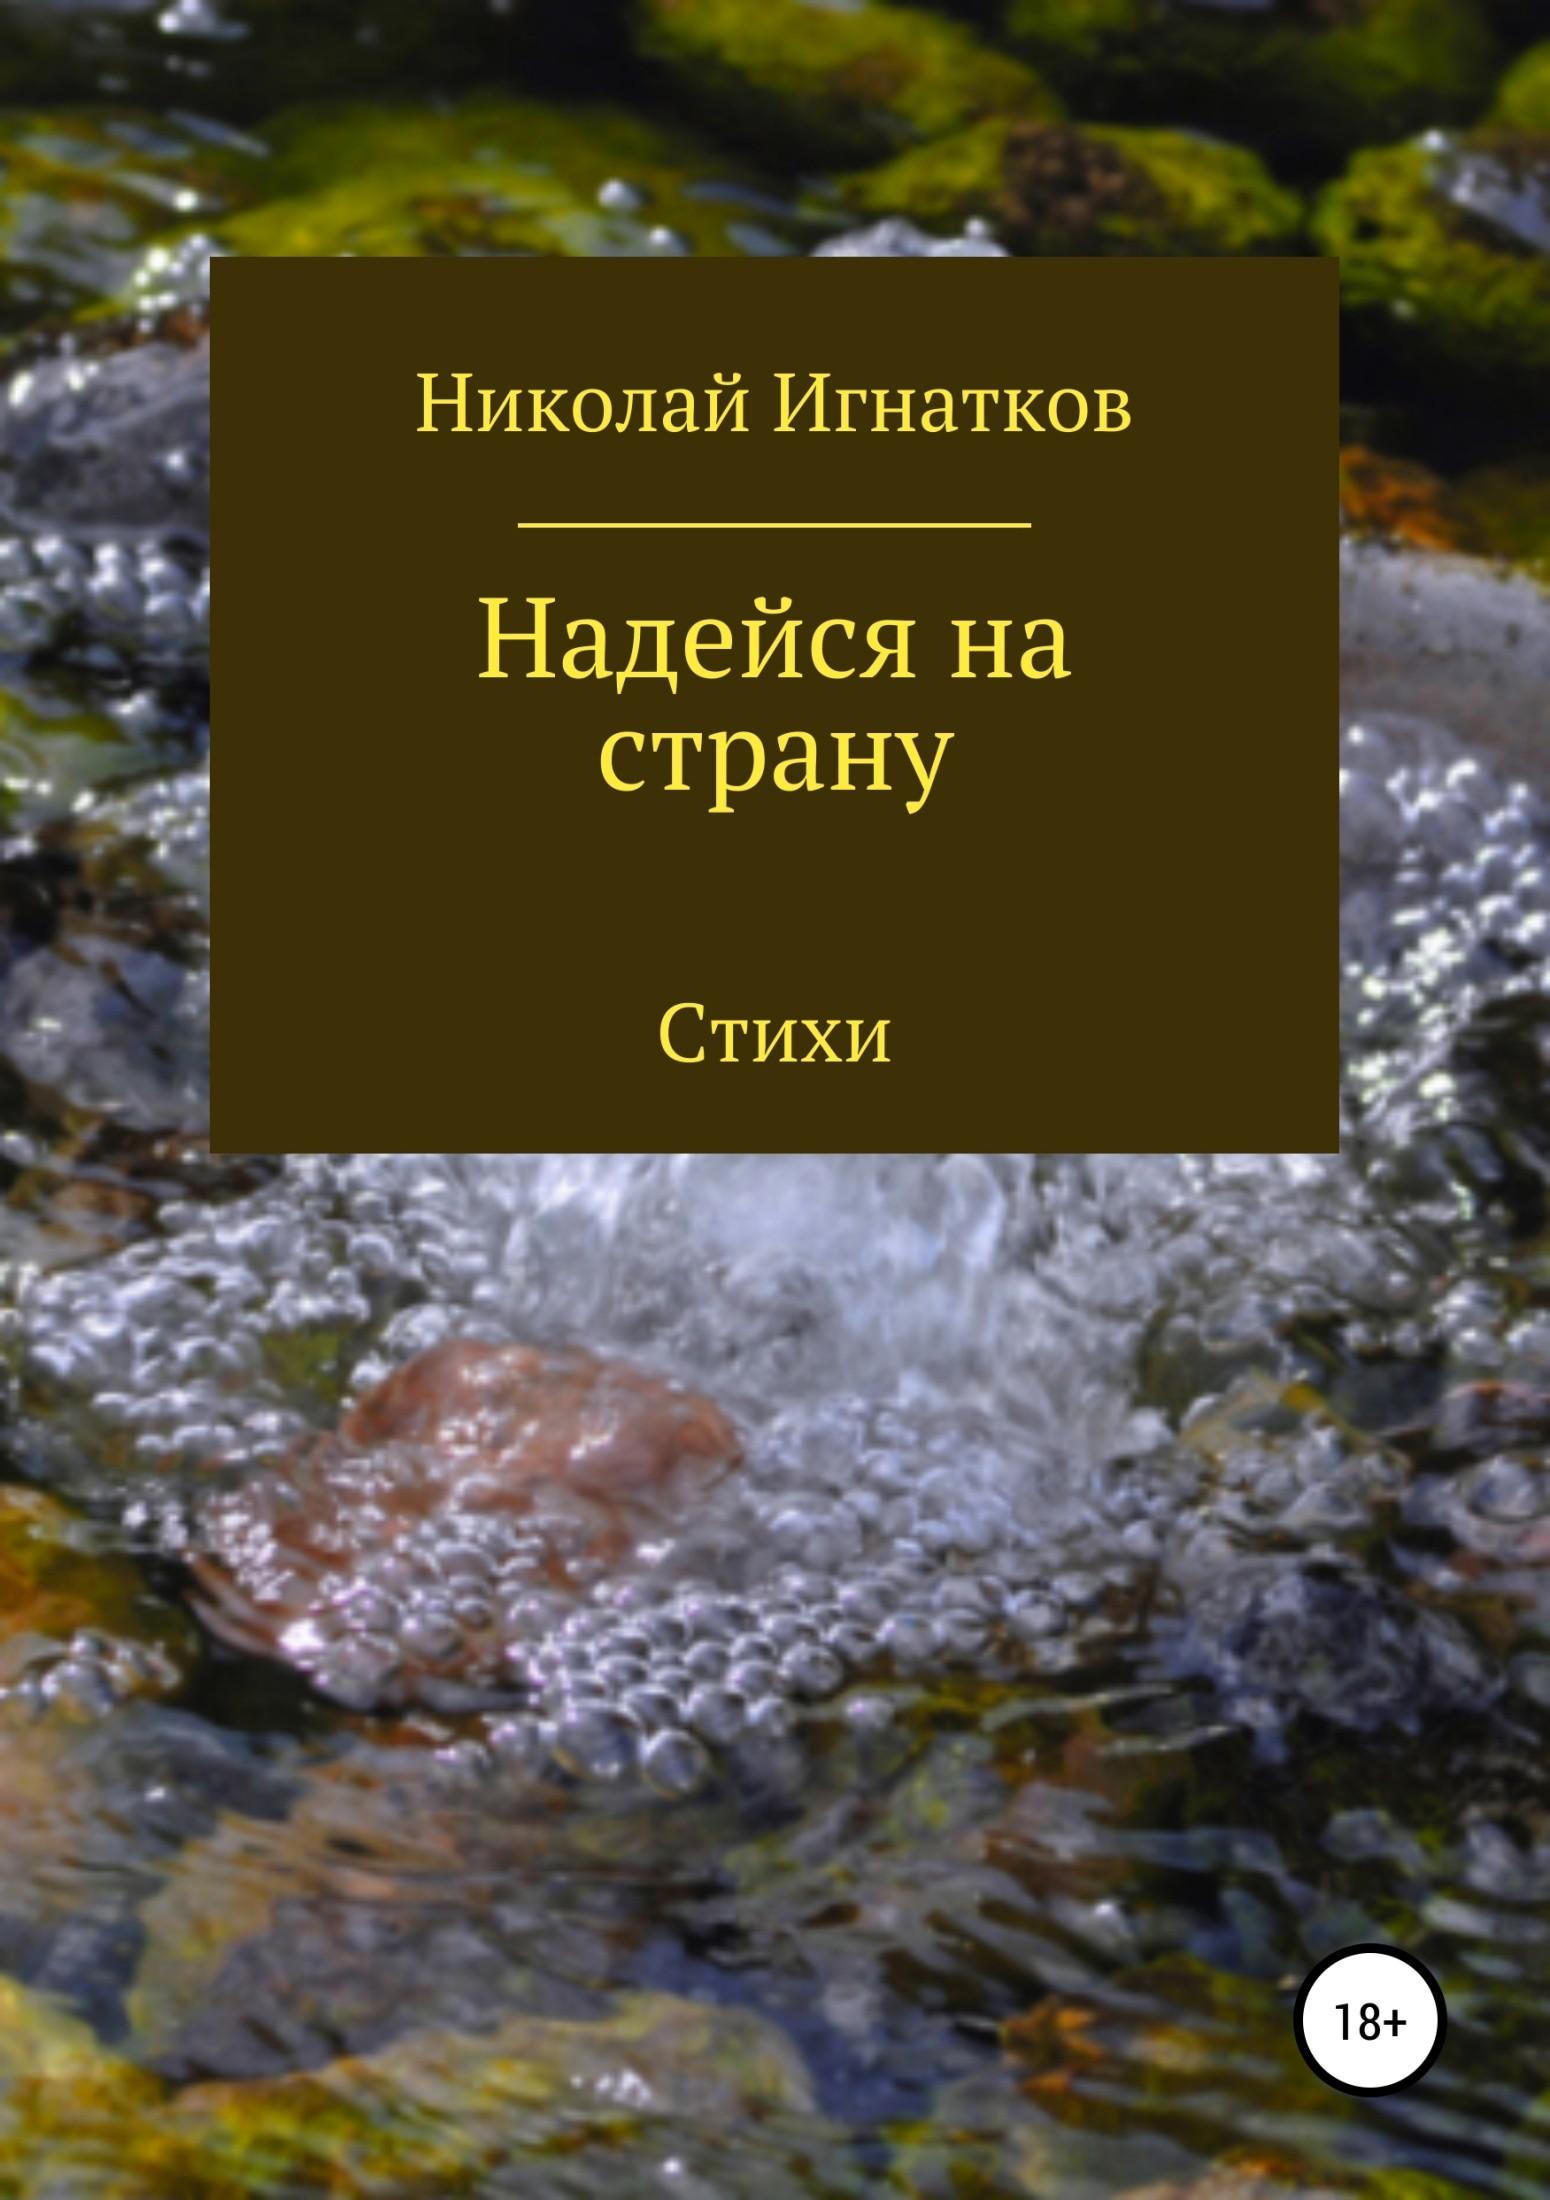 Николай Викторович Игнатков Надейся на страну. Сборник стихотворений цена